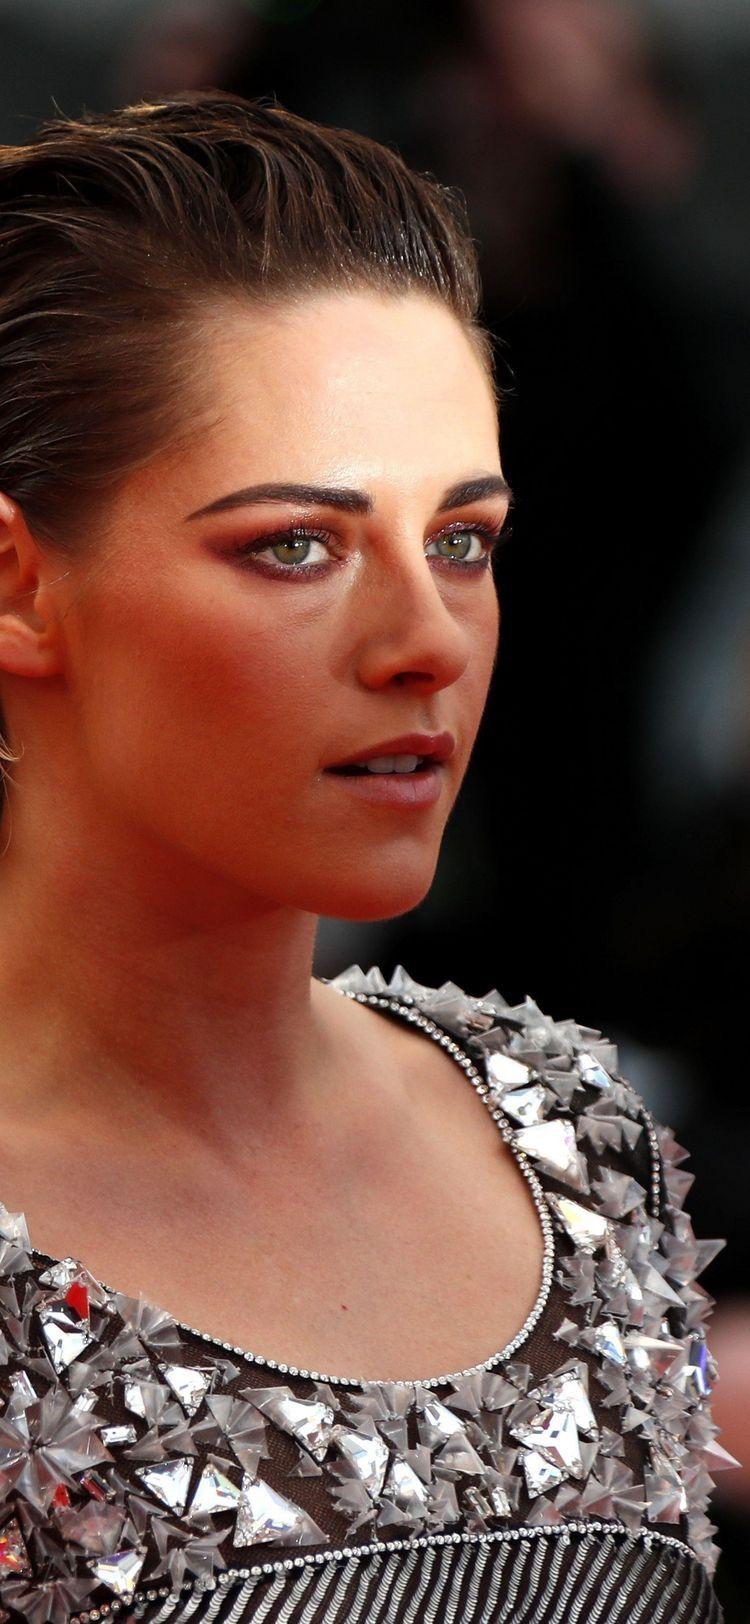 Pin by وسام البصراوي on Kristen stewart movies Kristen